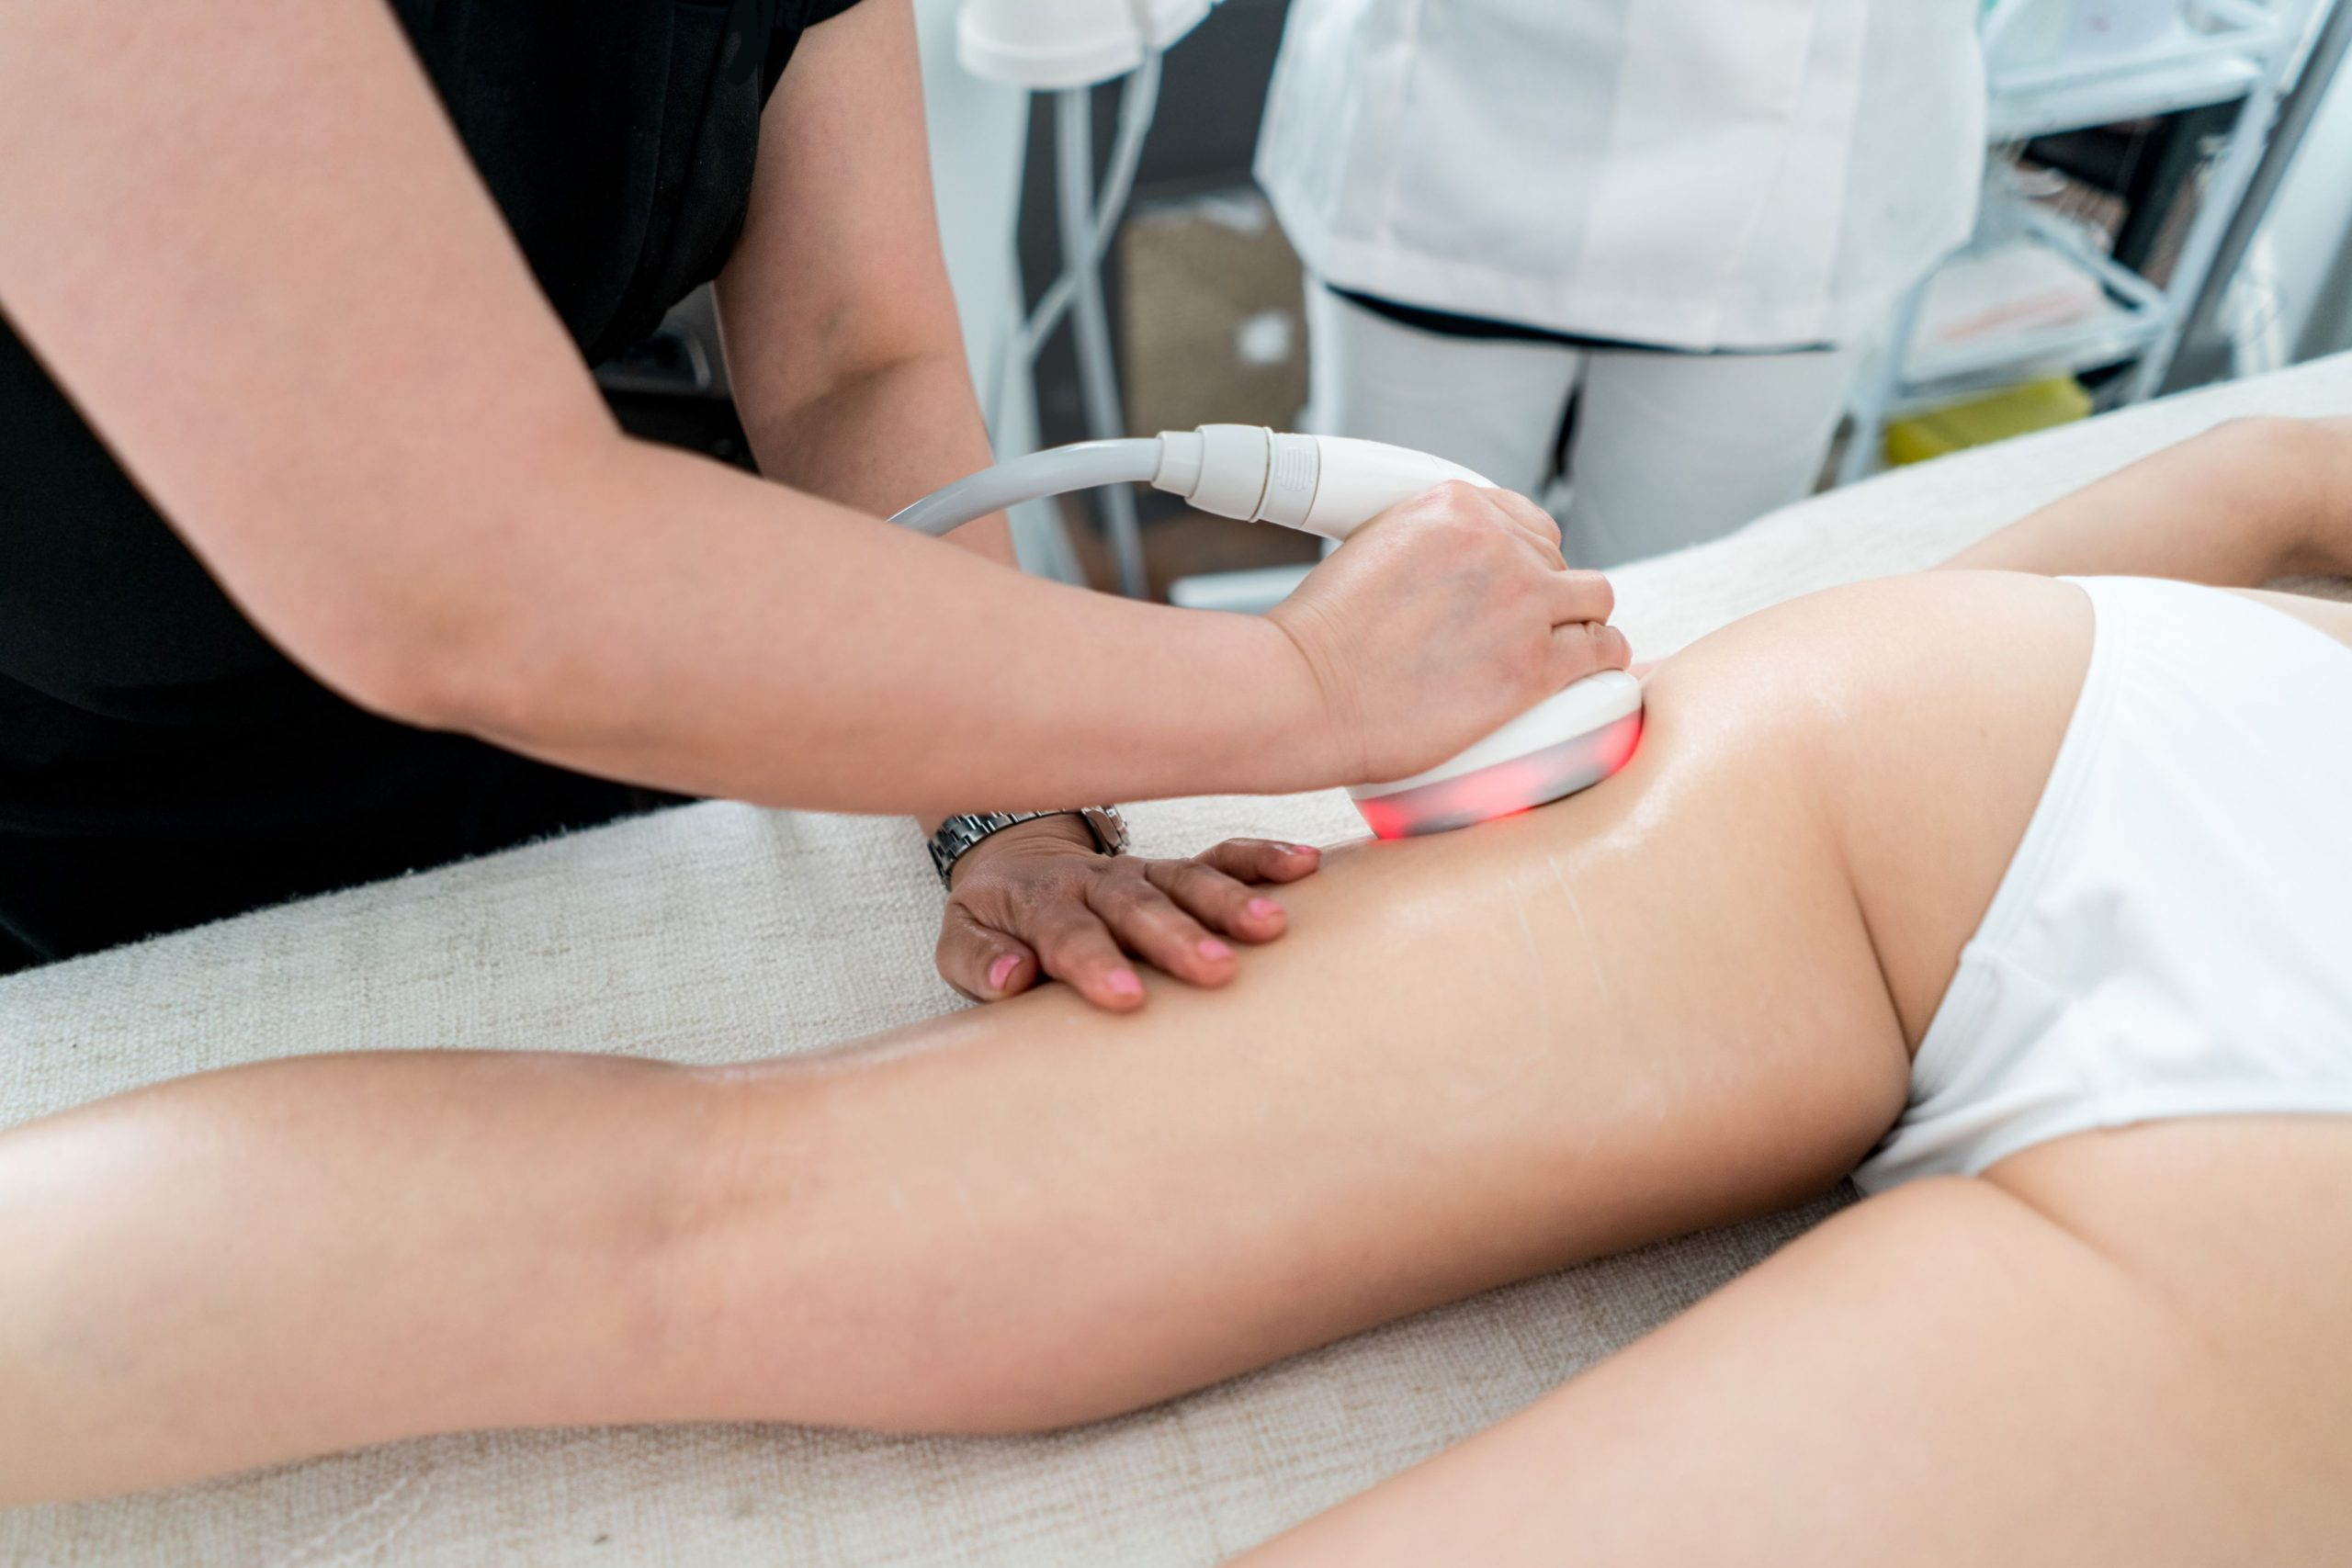 laser treatment to remove cellulite